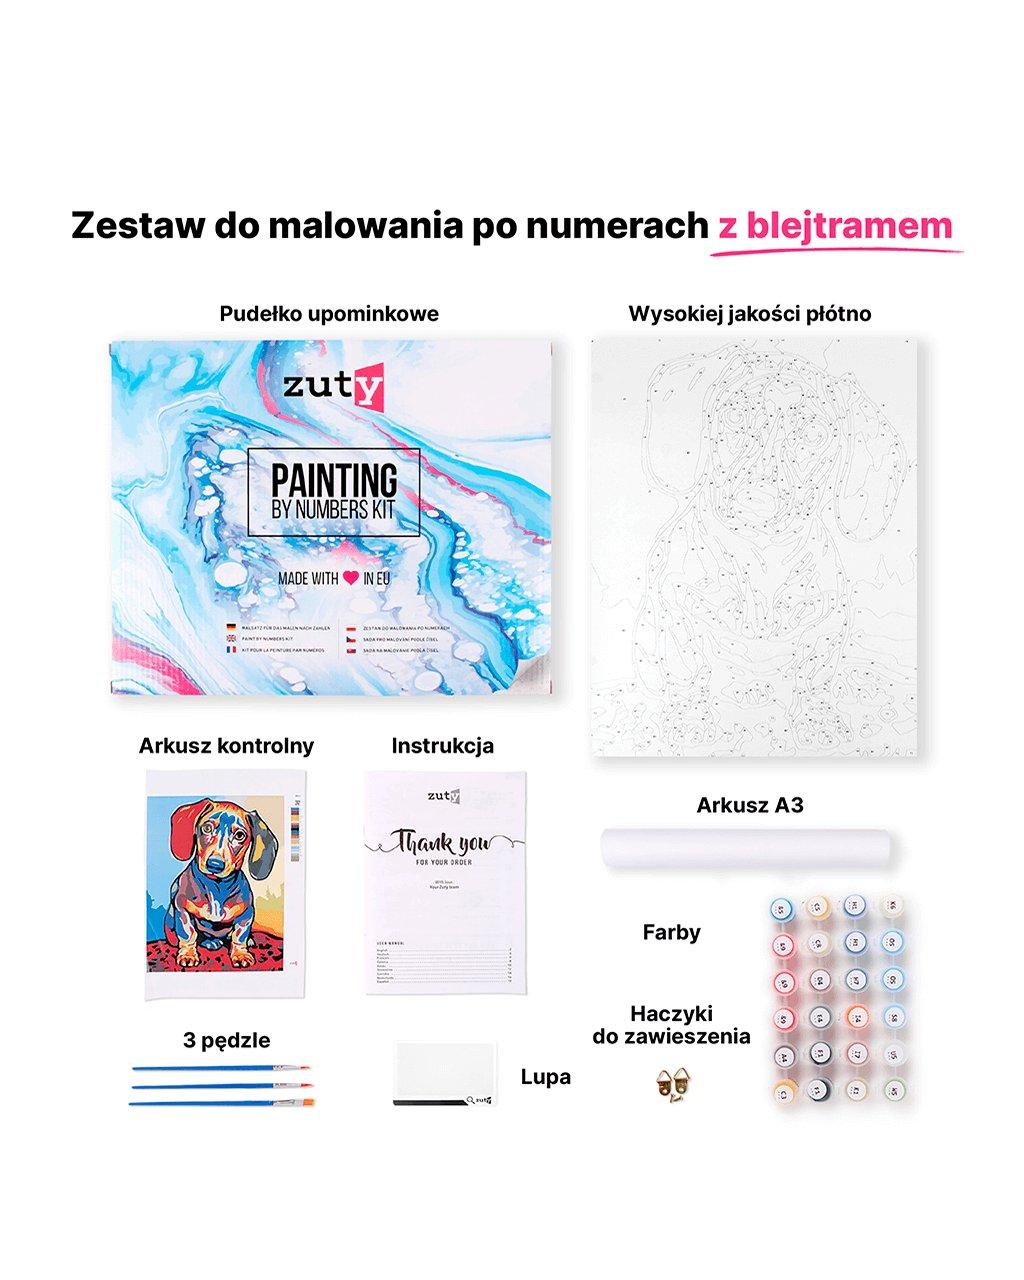 Malowanie po numerach – Wschód słońca nad górami